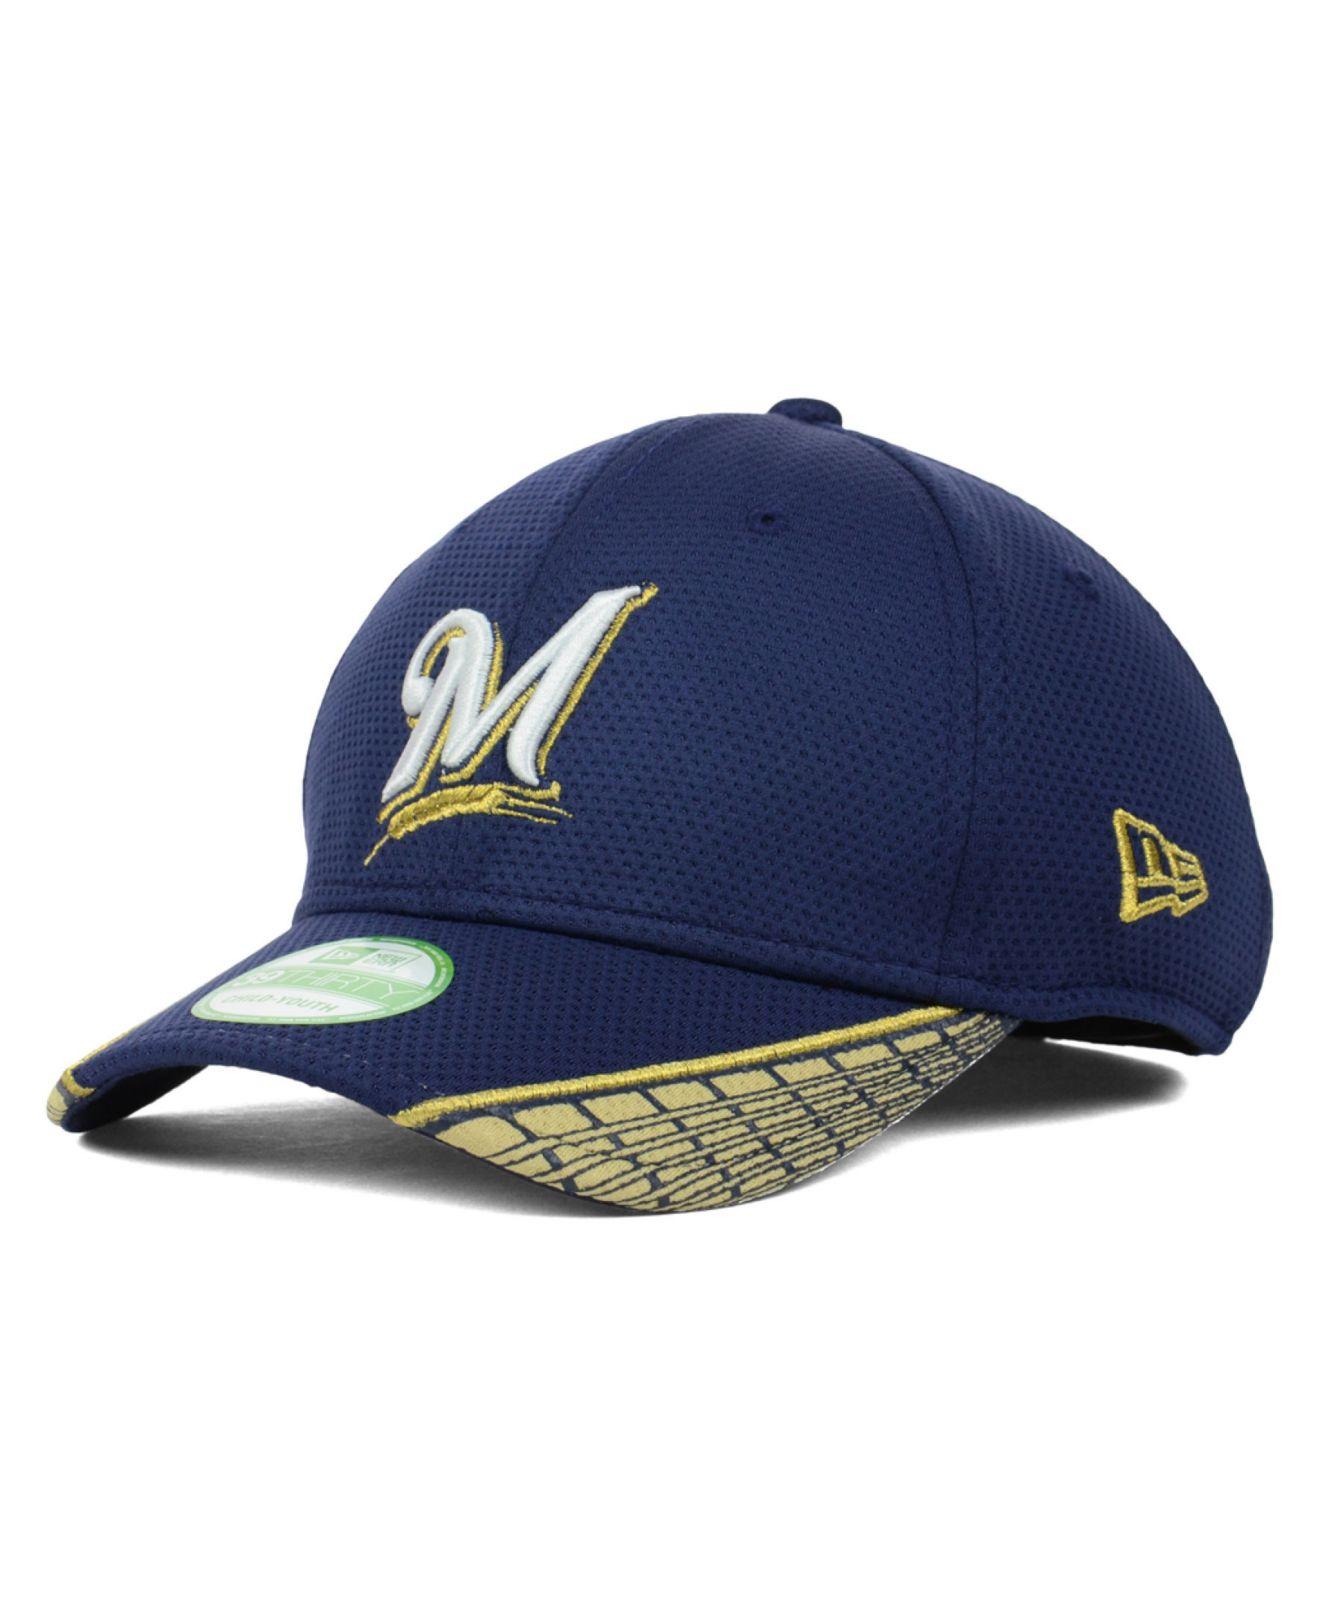 Lyst - Ktz Kids Milwaukee Brewers Vertical Strike 39thirty Cap in ... a49a299c0134